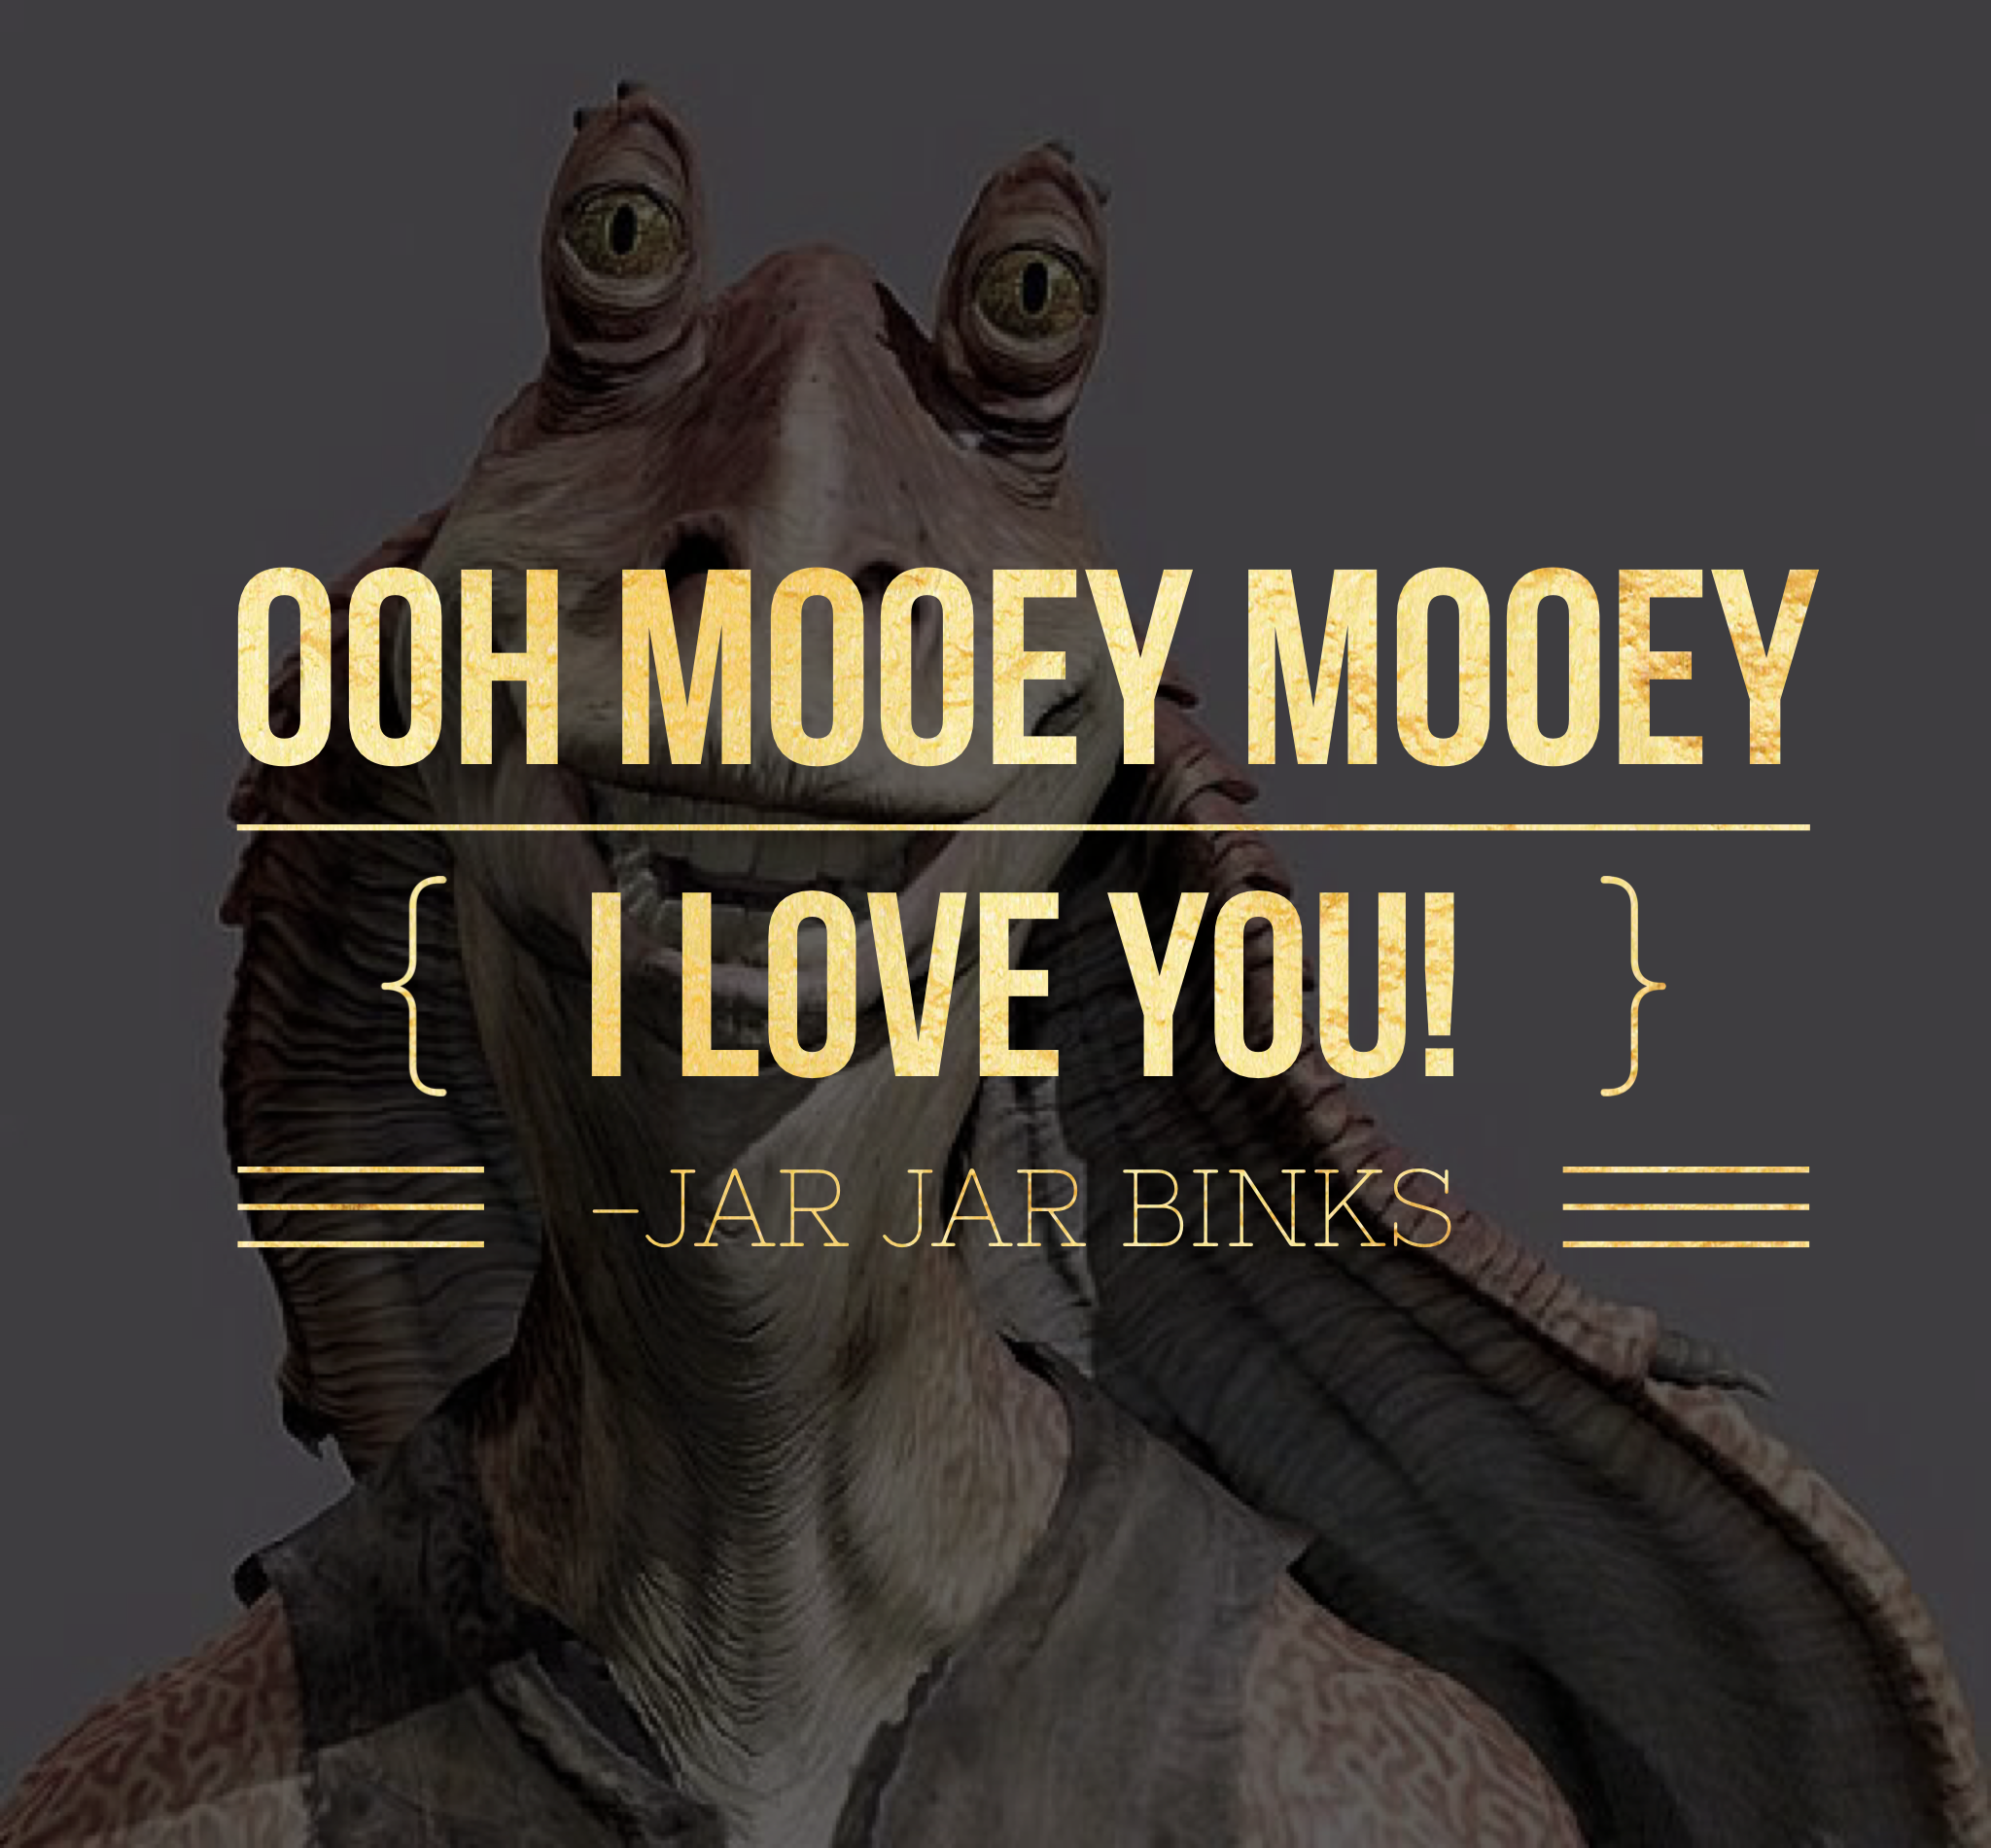 Jar Jar Binks Quotes star wars character quote • jar jar binks | STAR WARS | Star wars  Jar Jar Binks Quotes